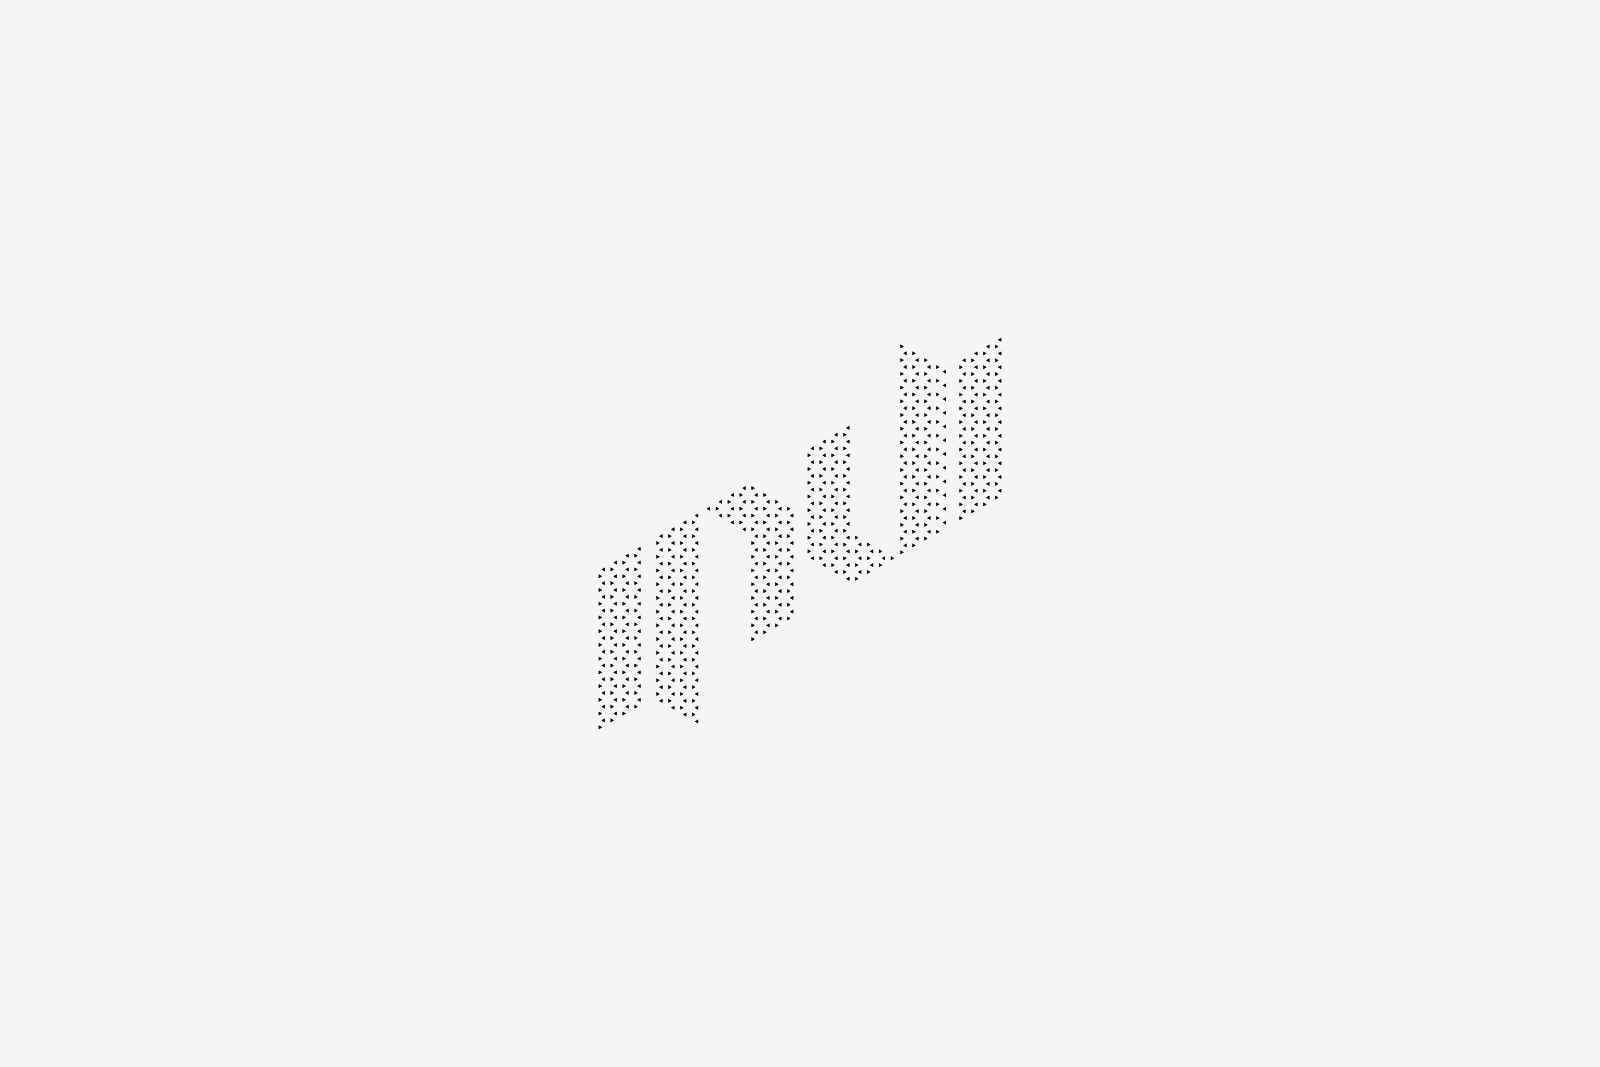 ostreet-indi-01-logo